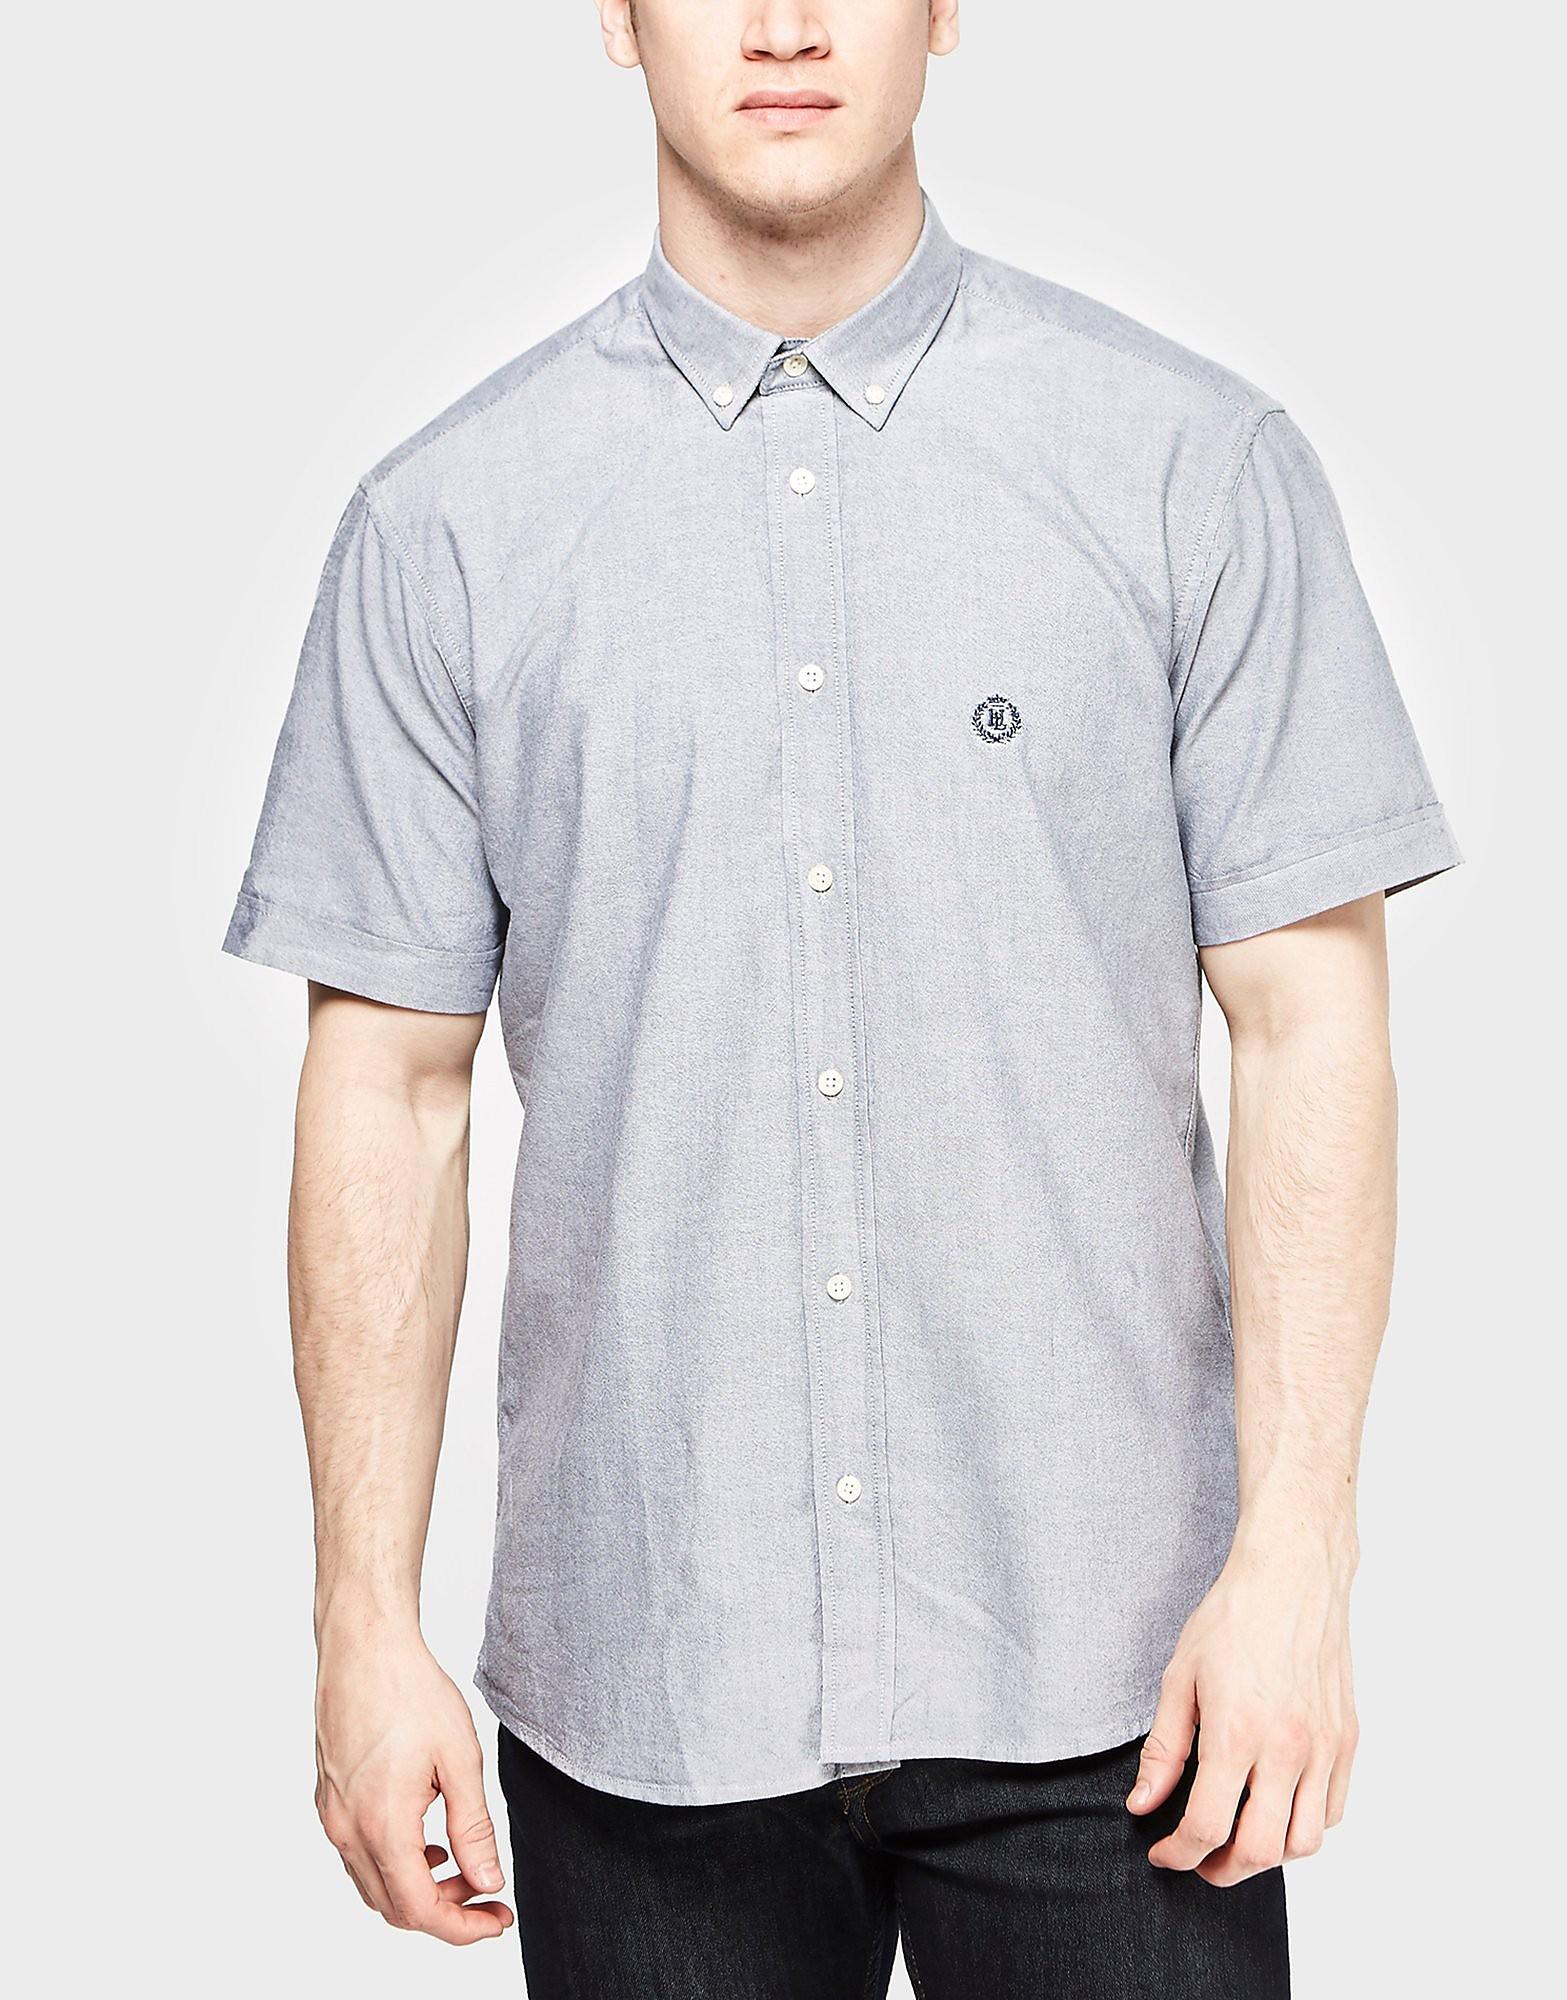 Henri Lloyd Short Sleeve Oxford Shirt